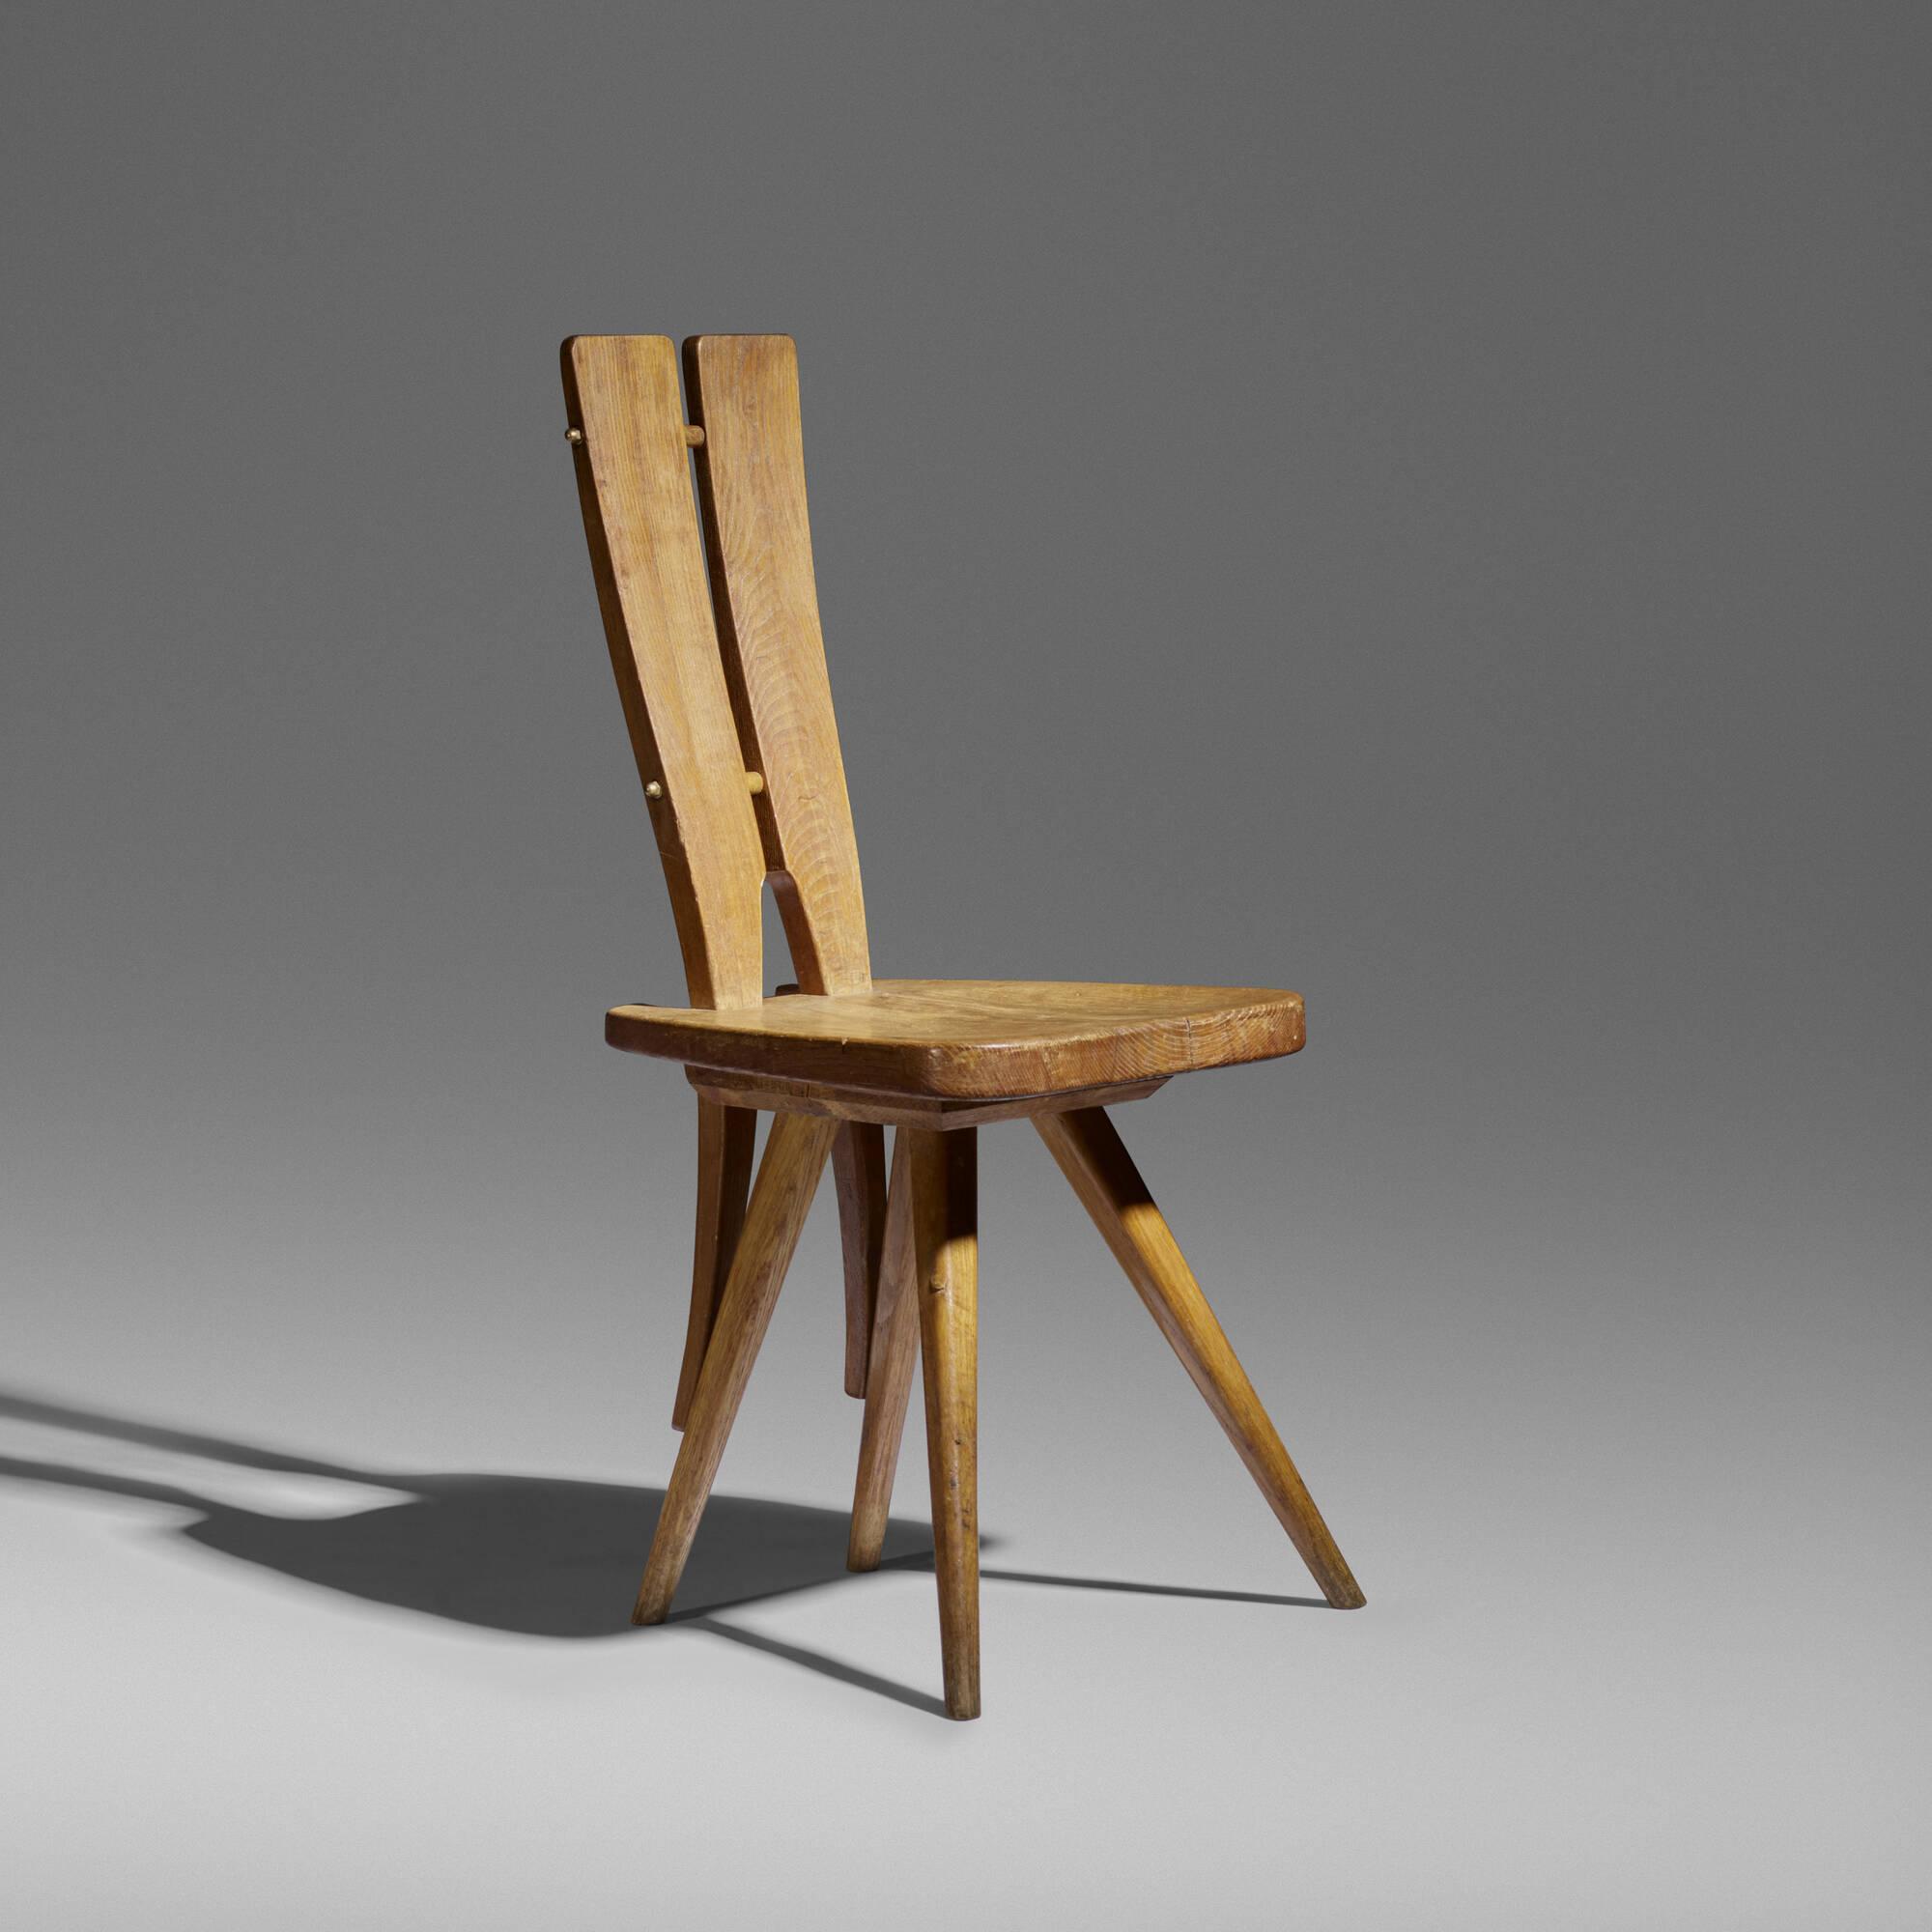 37 Carlo Mollino Chair From Casa Del Sole Masterworks 25 May